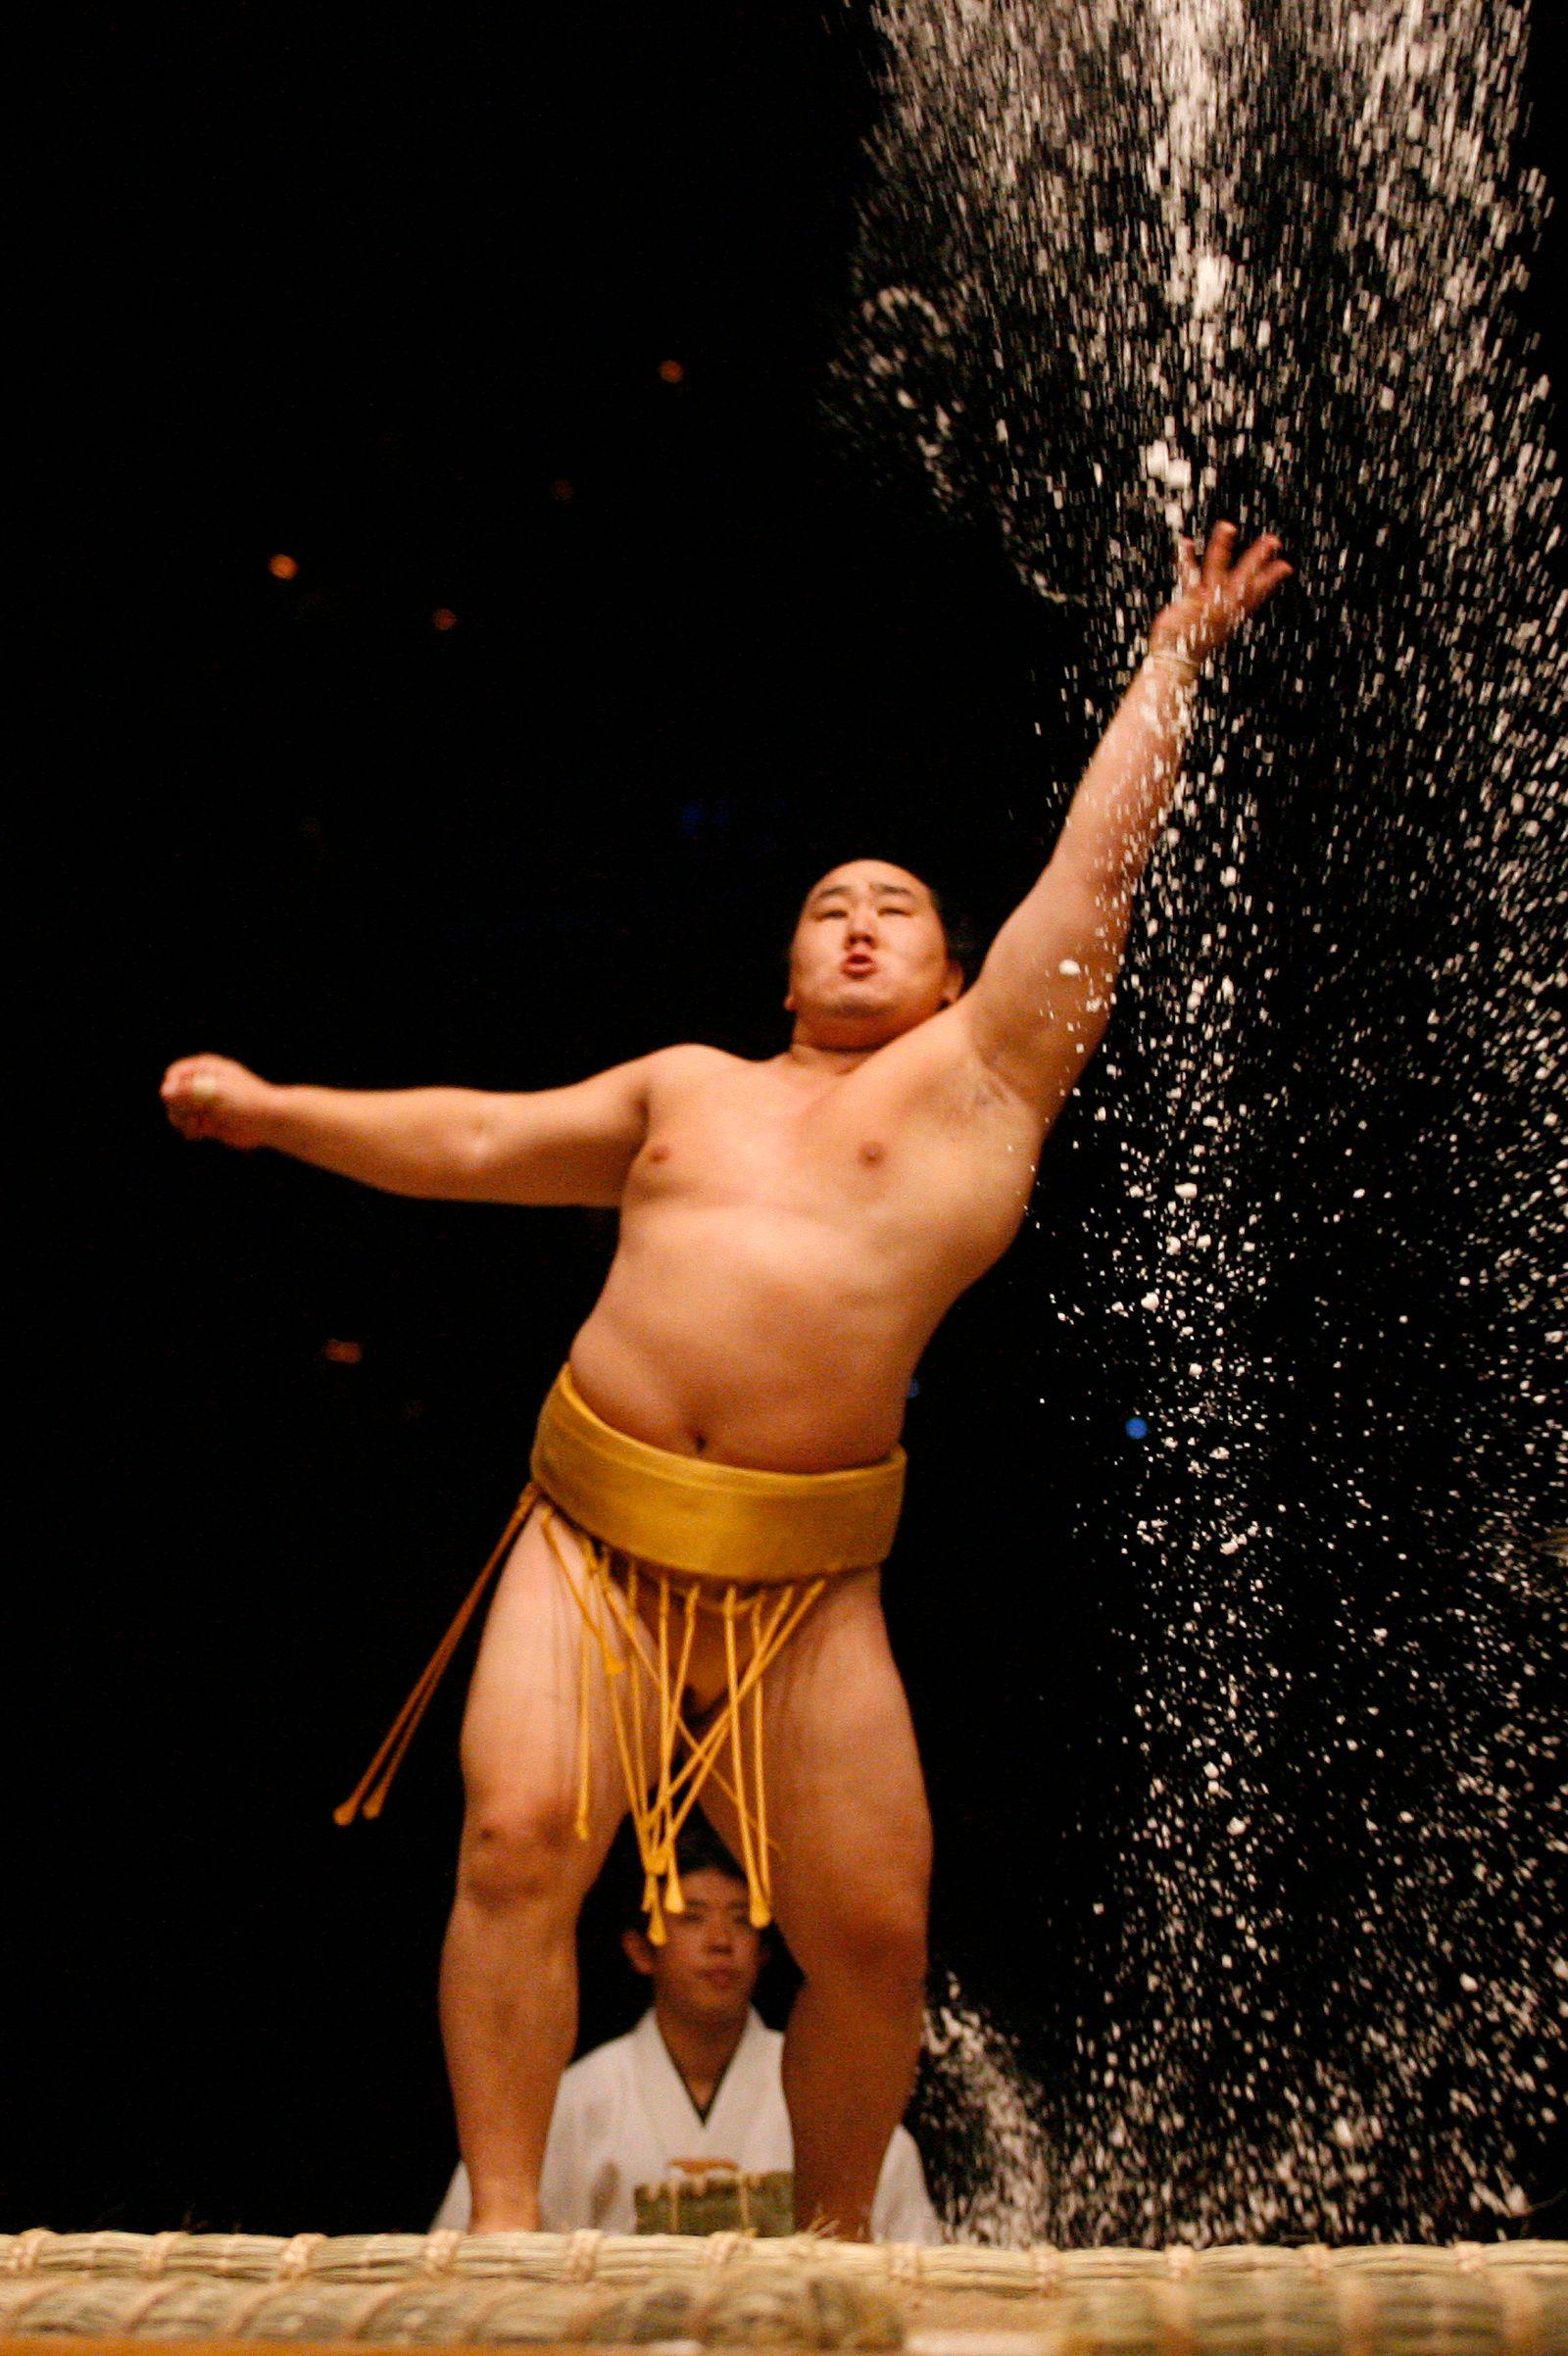 Sumo wrestling comes to Las Vegas